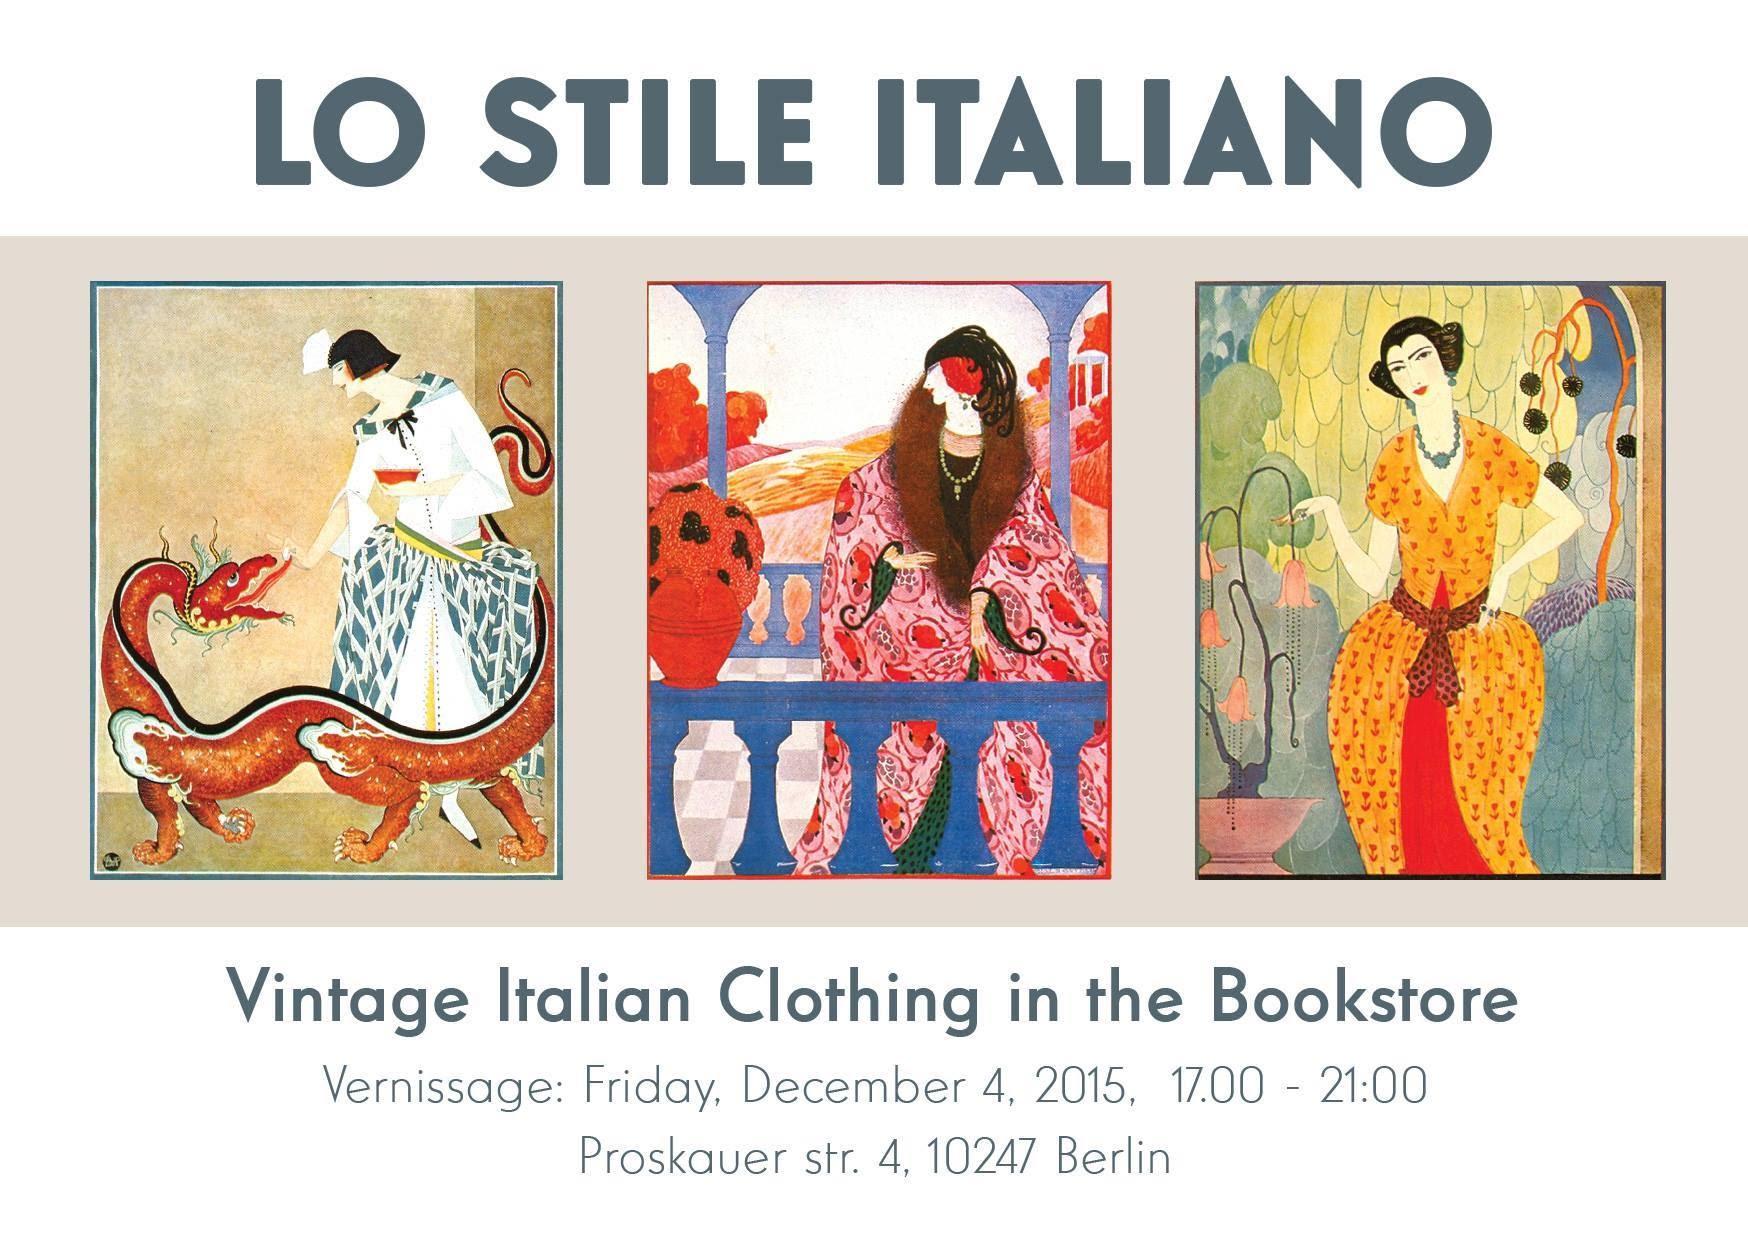 lo stile italiano vintage berlin luciano lapadula vito antonio lerario amanda kastrati berlino mode